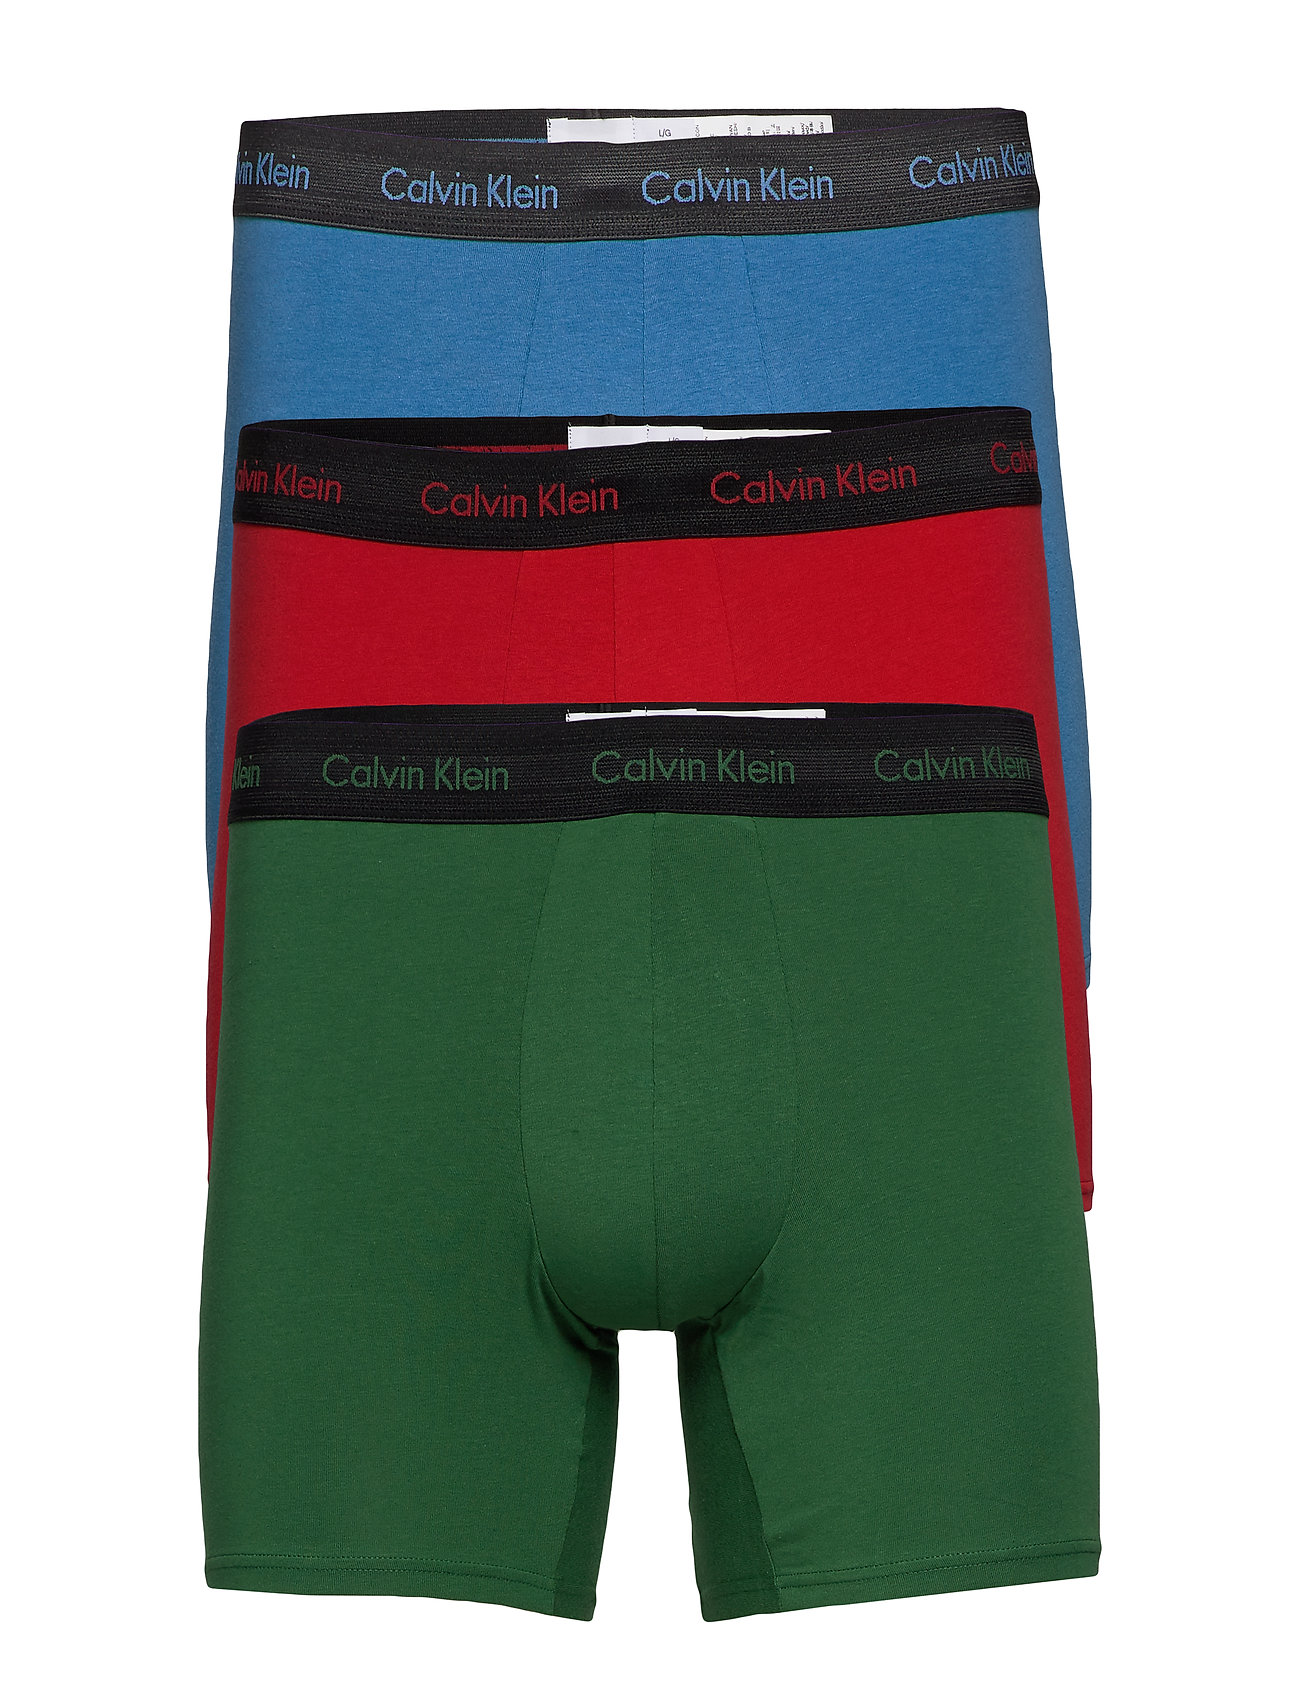 Calvin Klein BOXER BRIEF 3PK - EDEN/ VALLARTA BLUE/ TEMPER W/